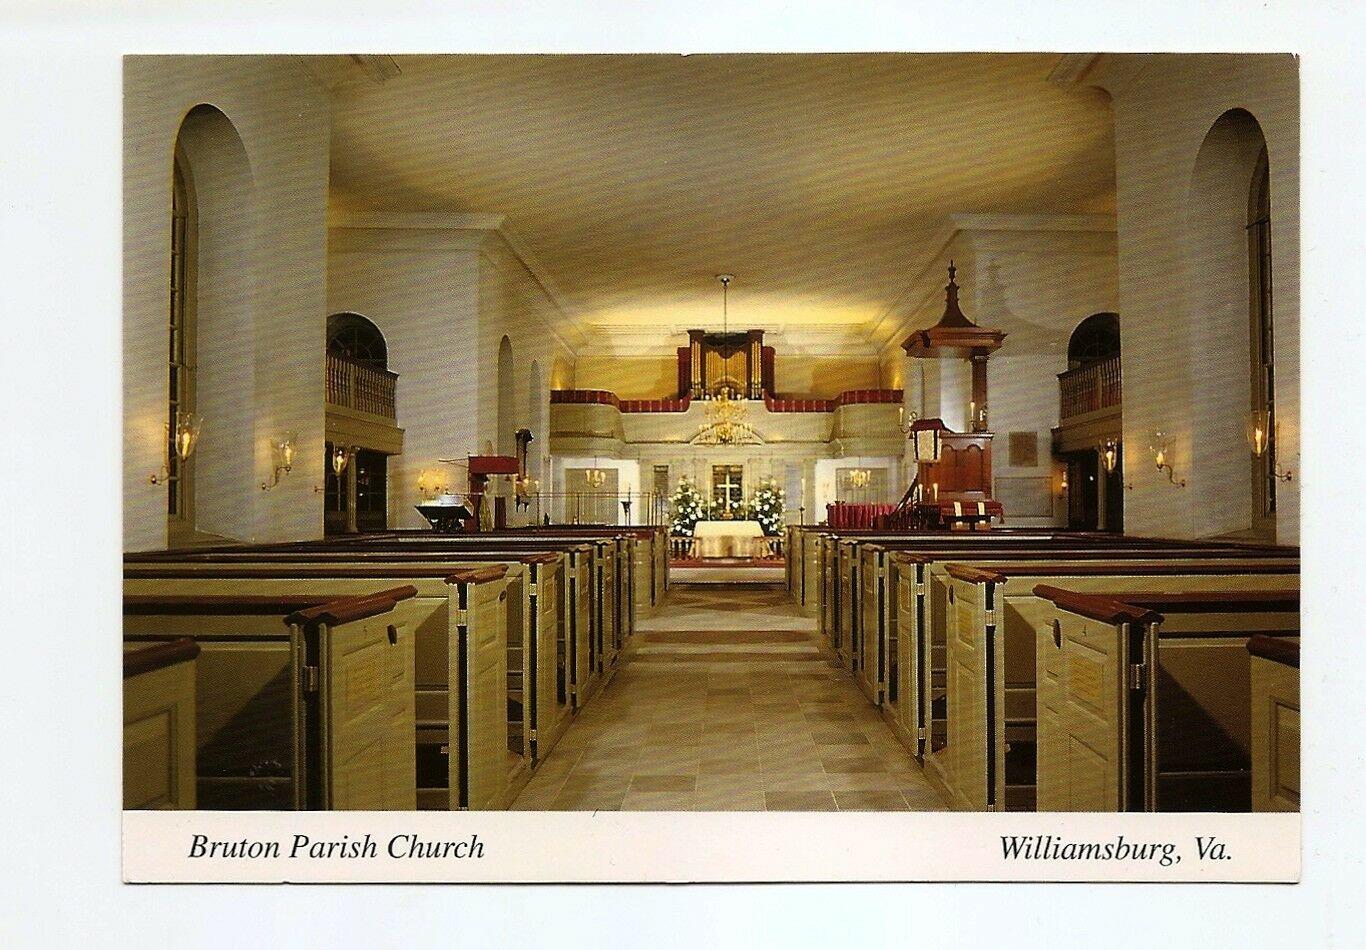 POSTCARD - Bruton Parish Church, Williamsburg Virginia 1990s